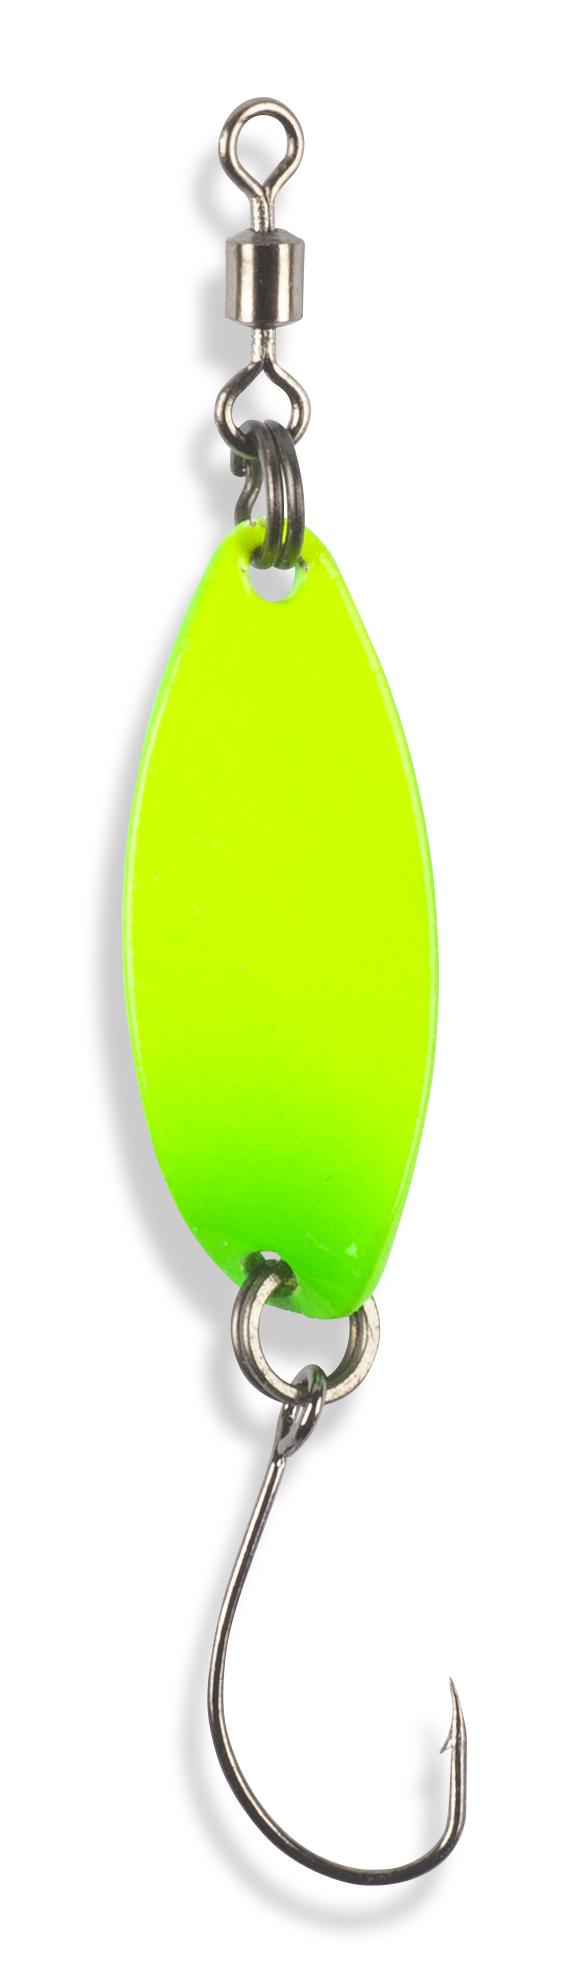 Třpytka Iron Trout Turbine Spoon Barva YGG